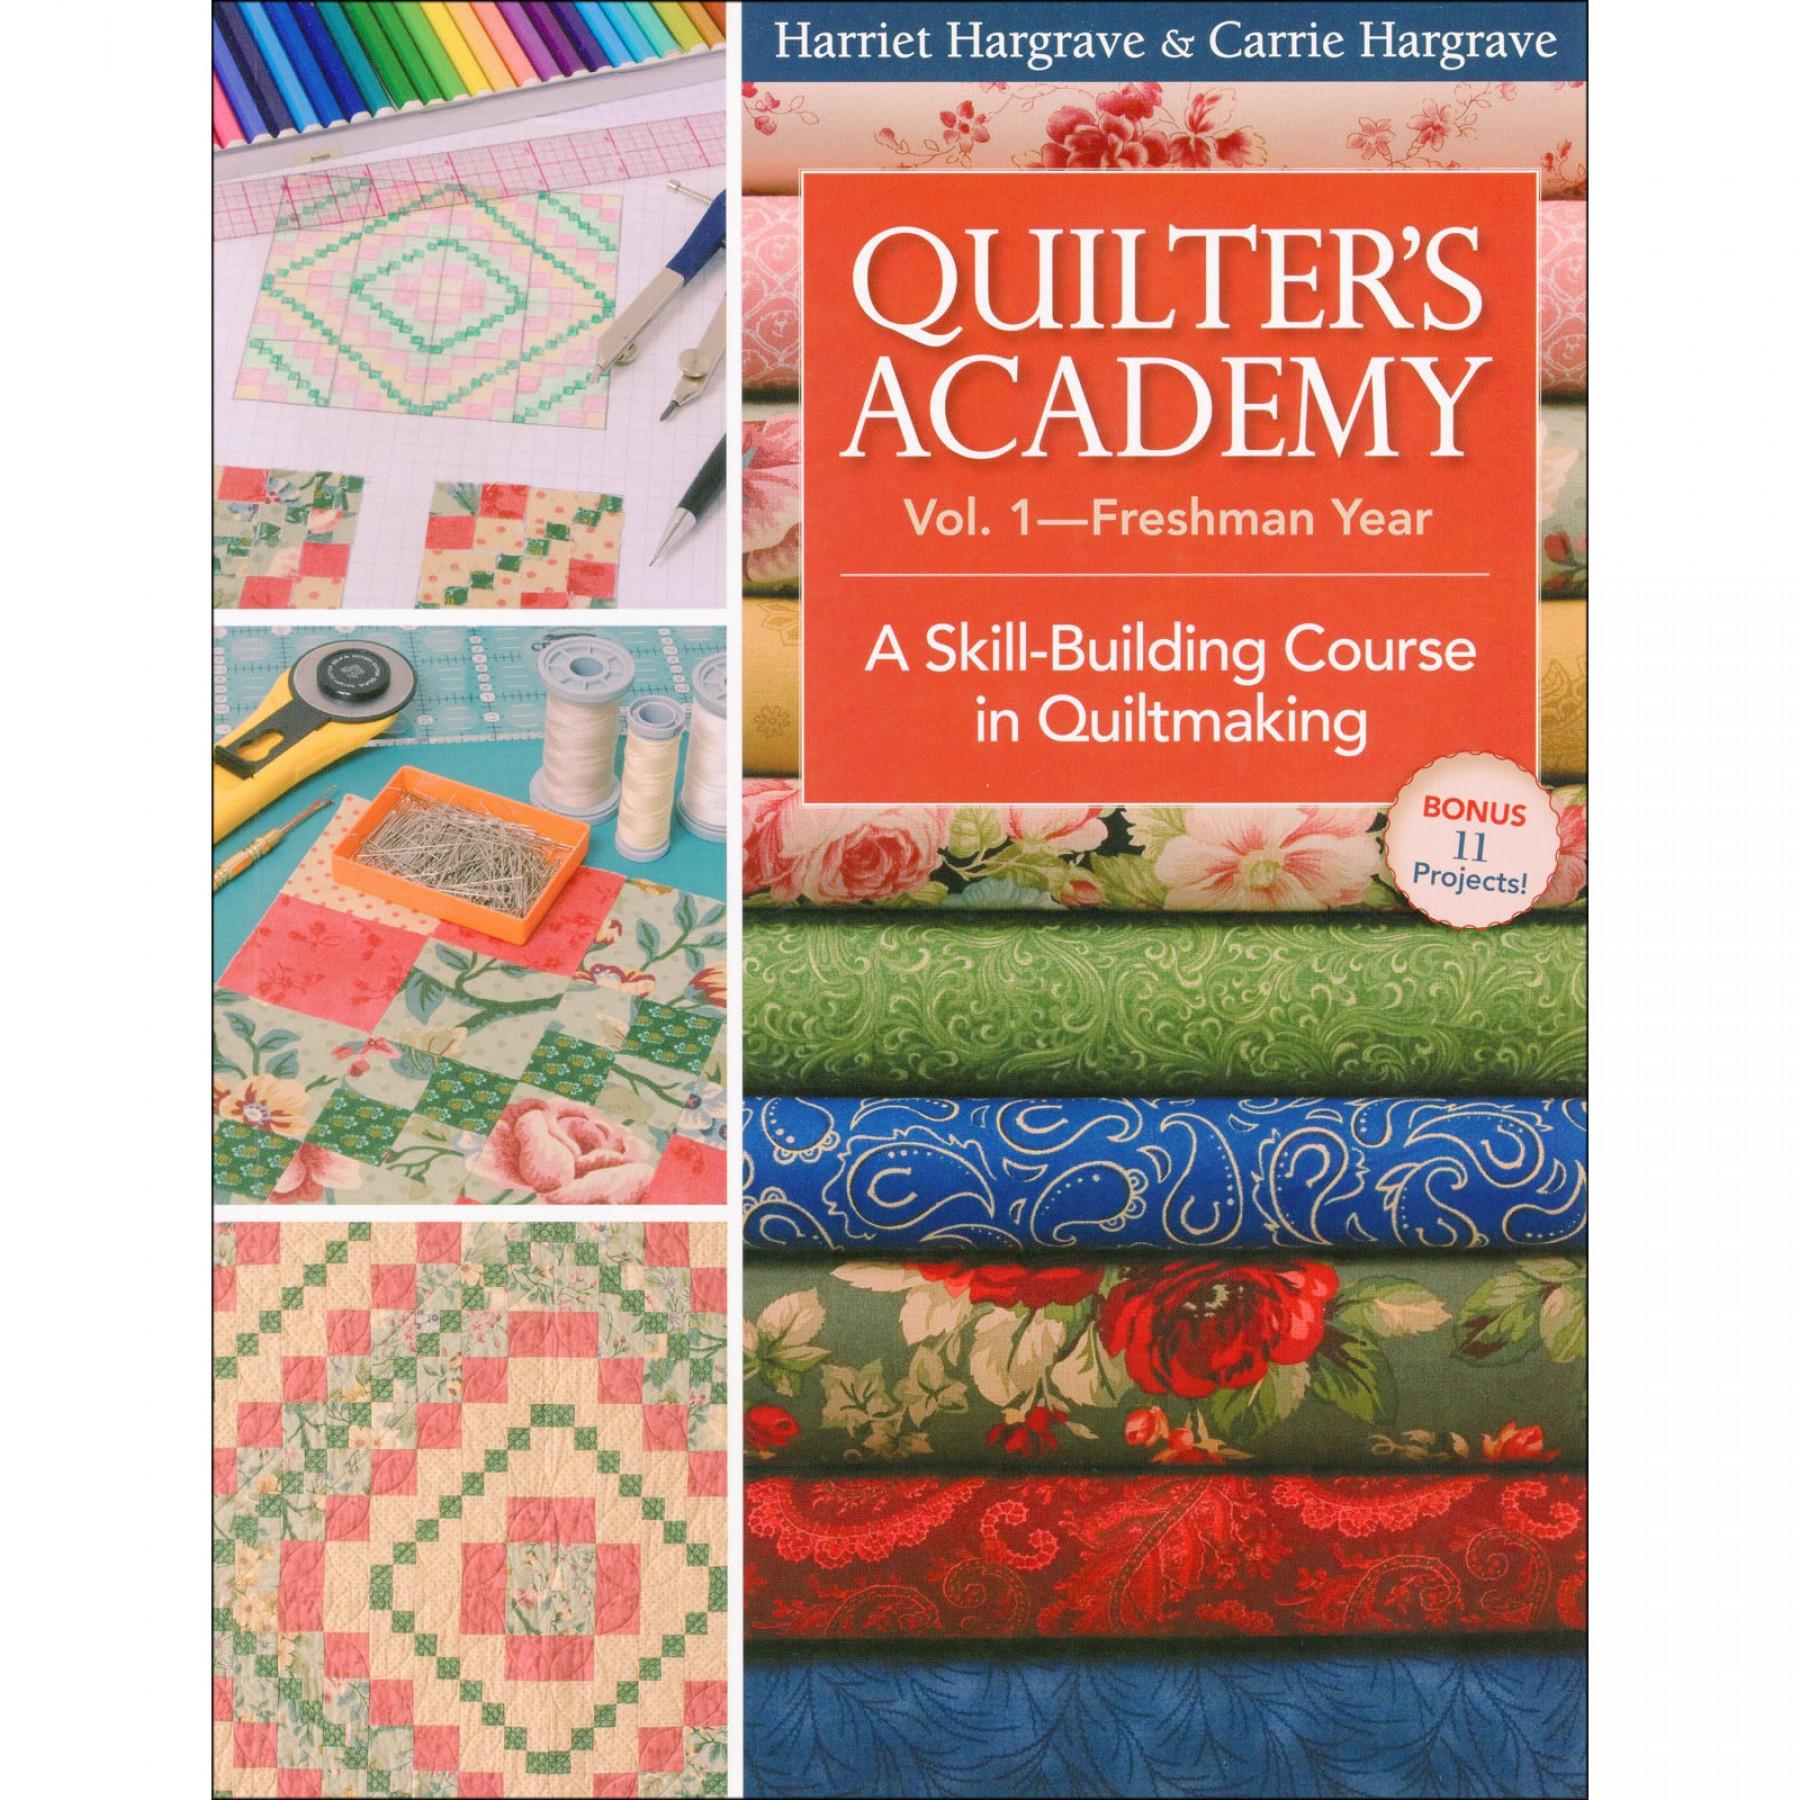 Quilter's Academy Vol. 1